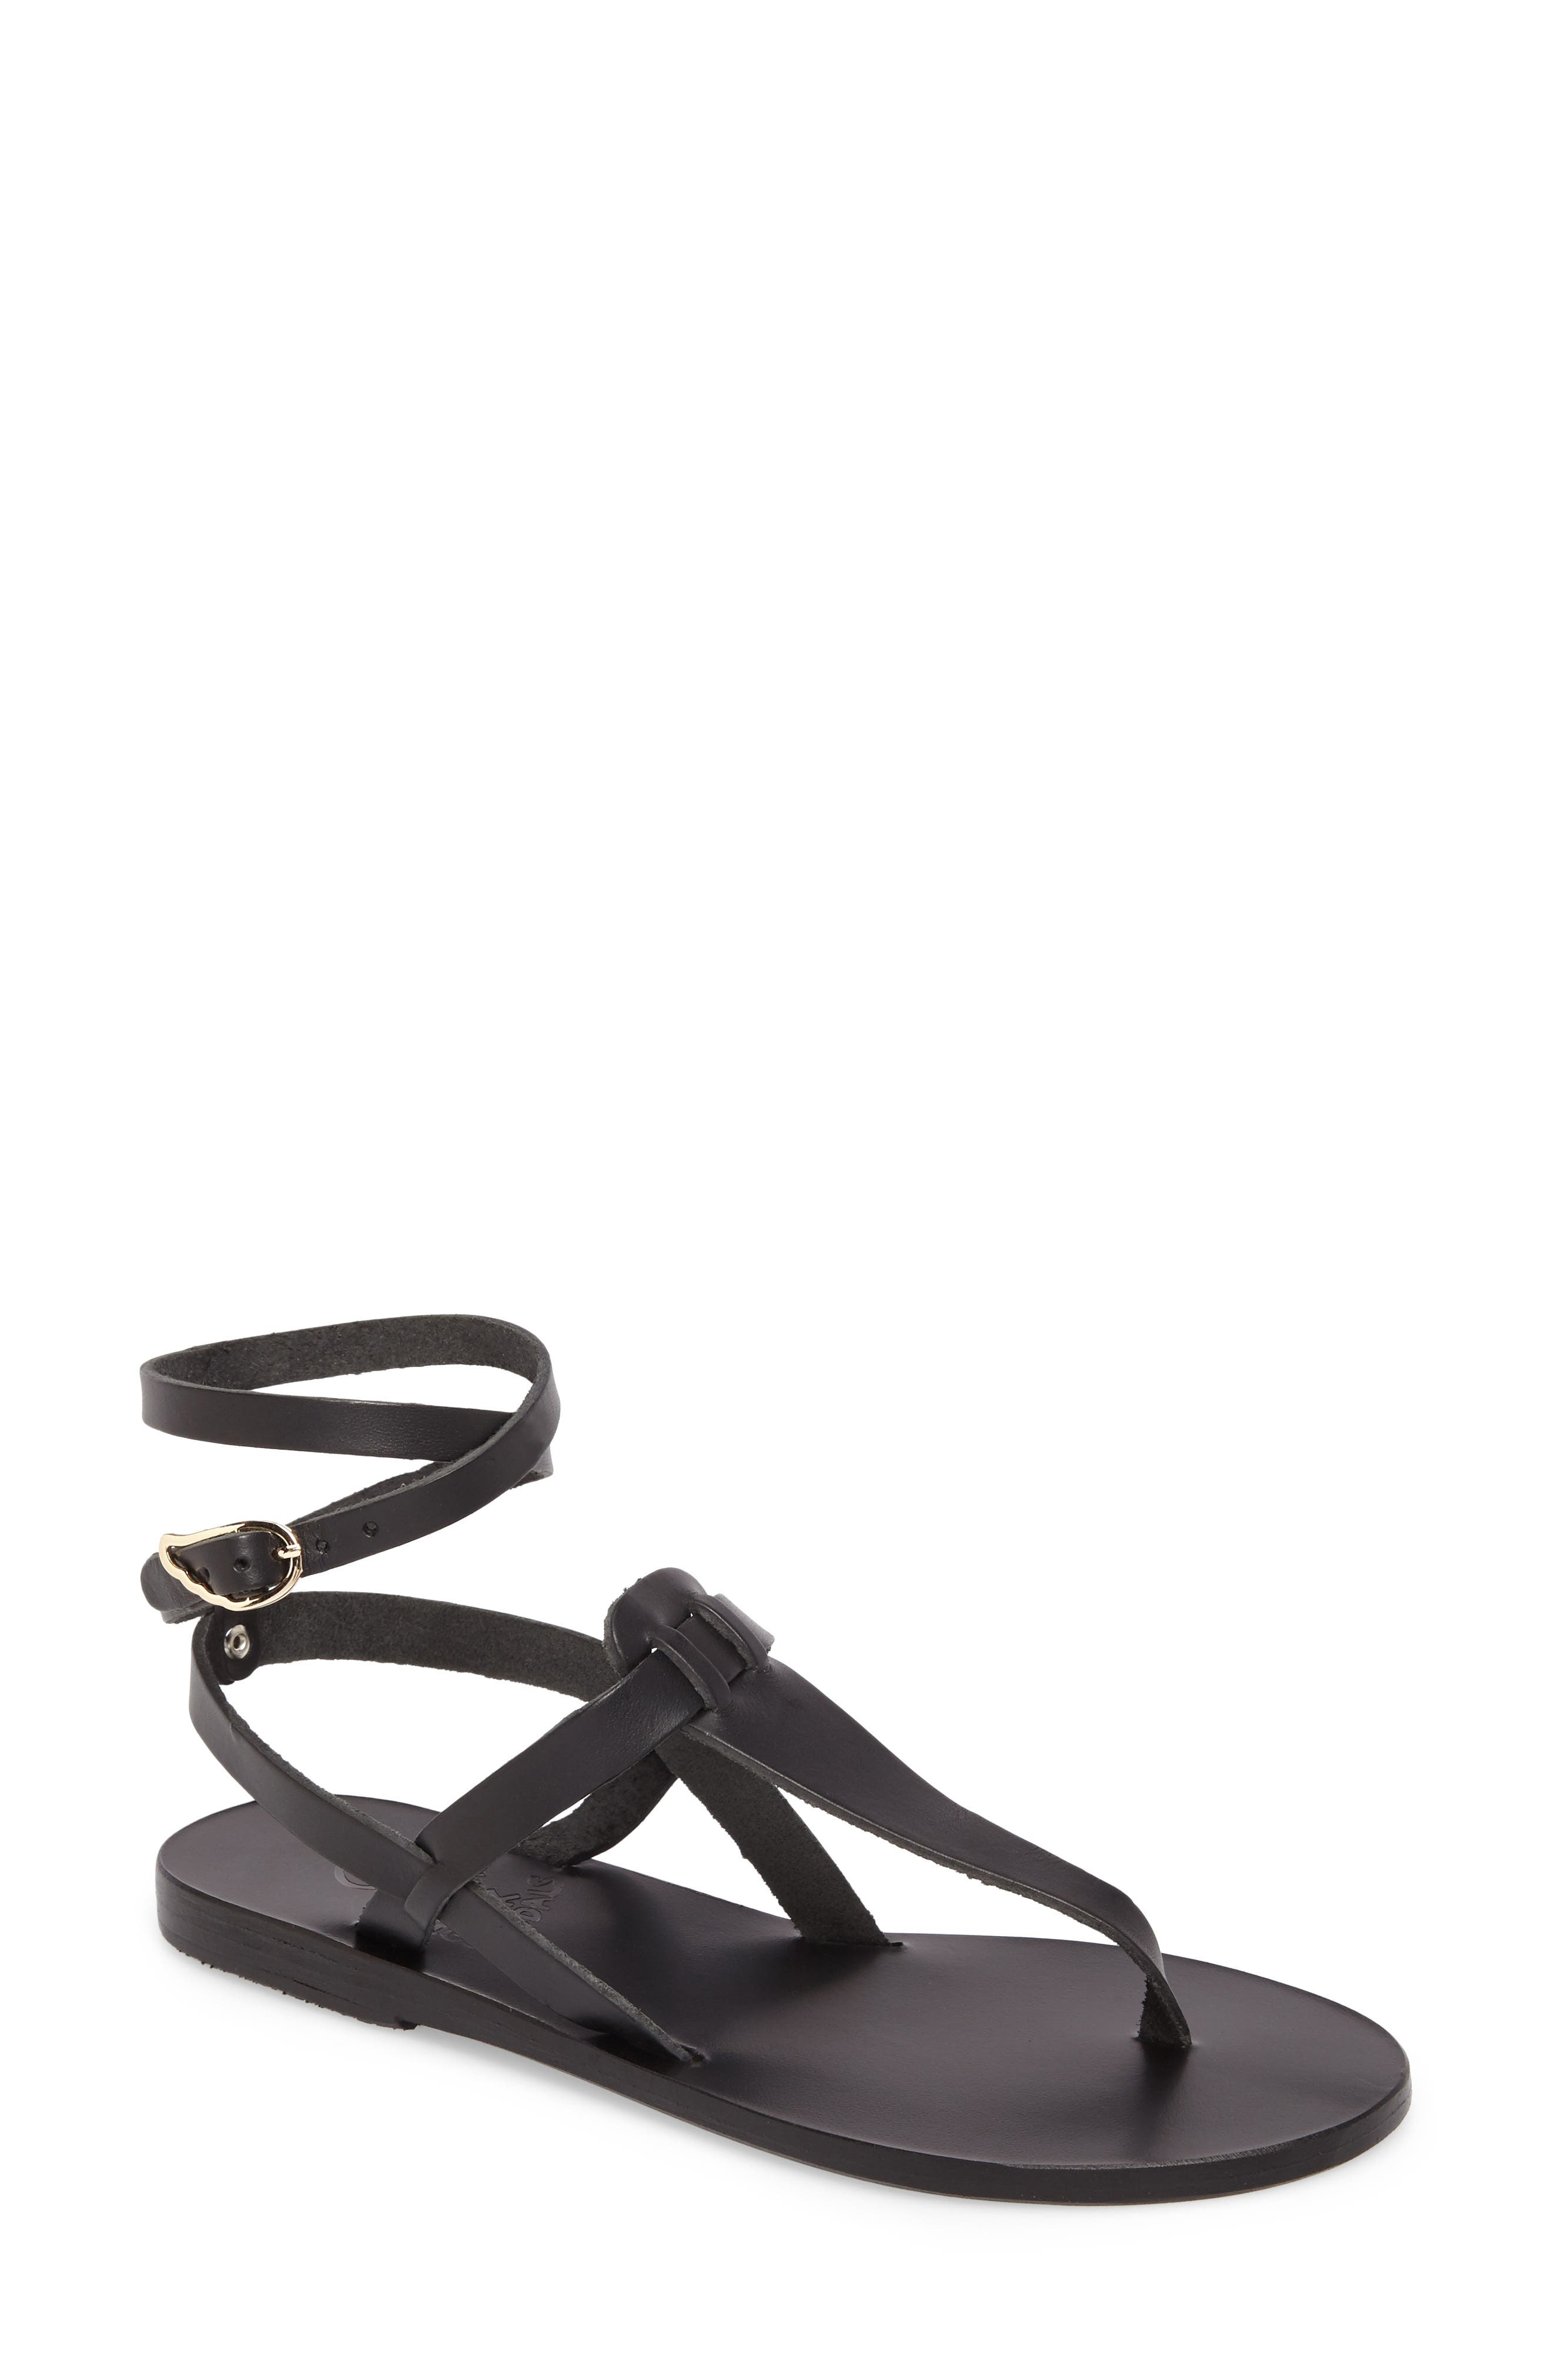 Alternate Image 1 Selected - Ancient Greek Sandals Estia Ankle Wrap Sandal (Women)